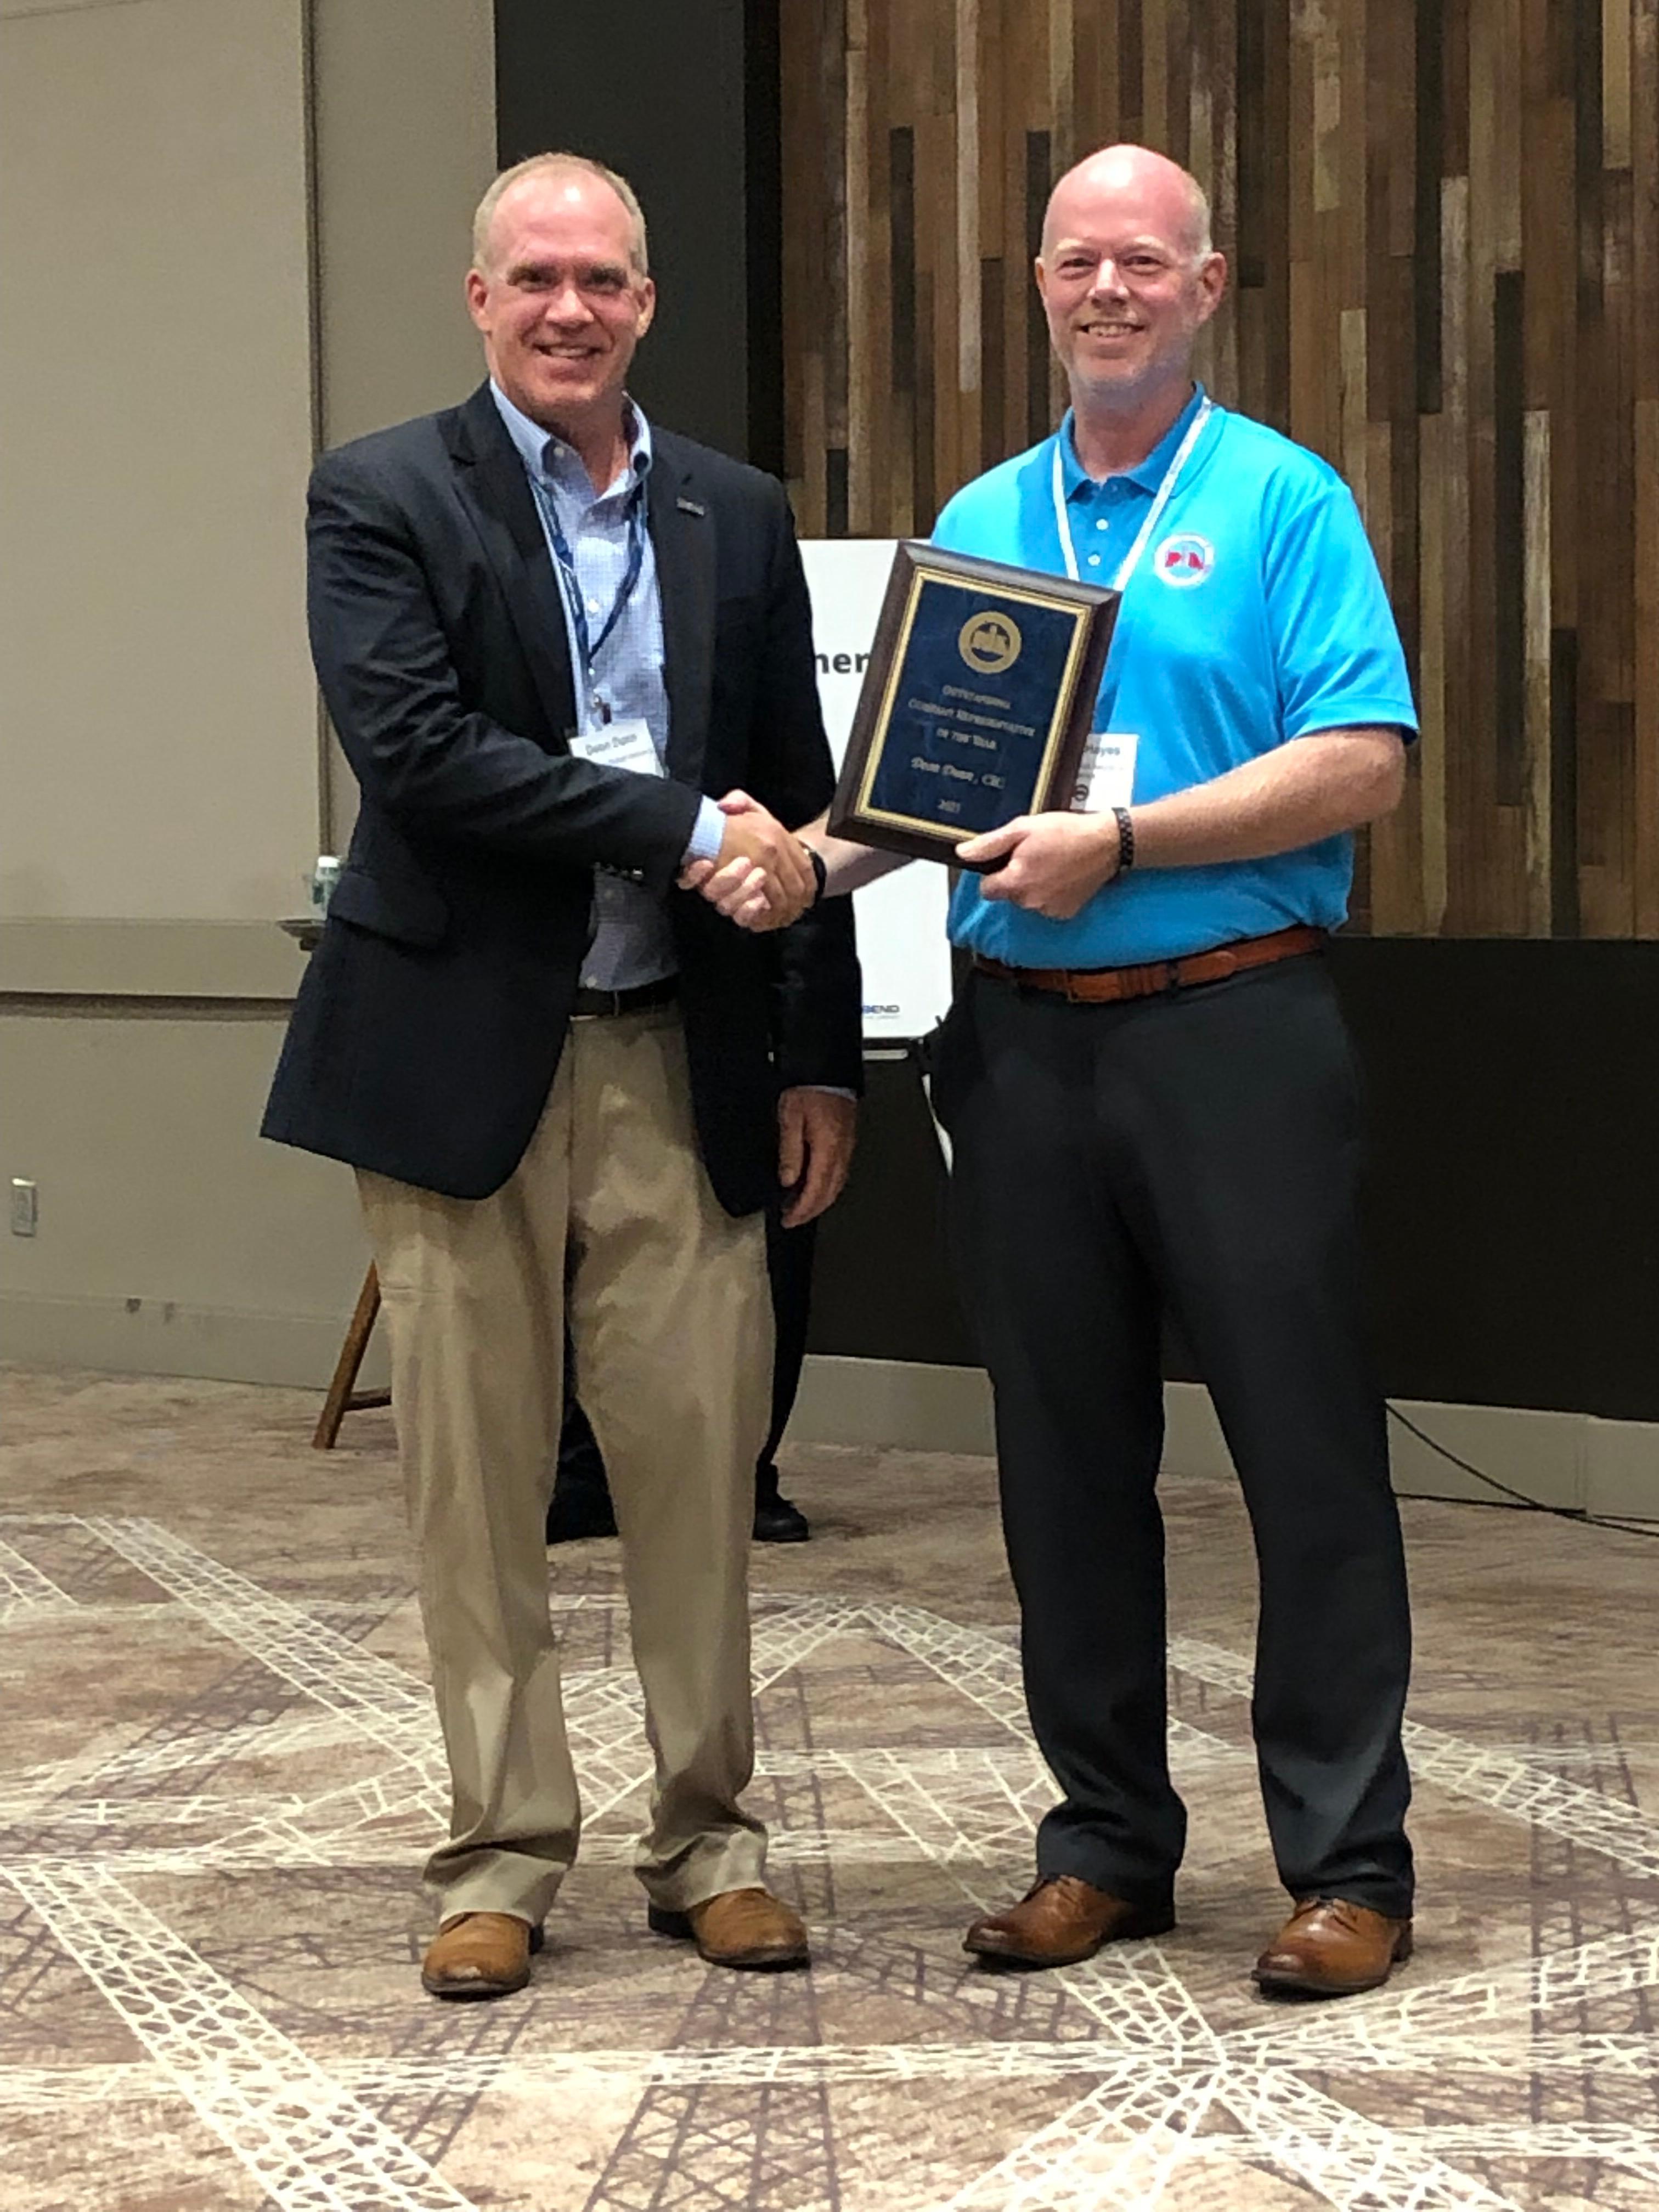 Deon Dunn NC PIA award